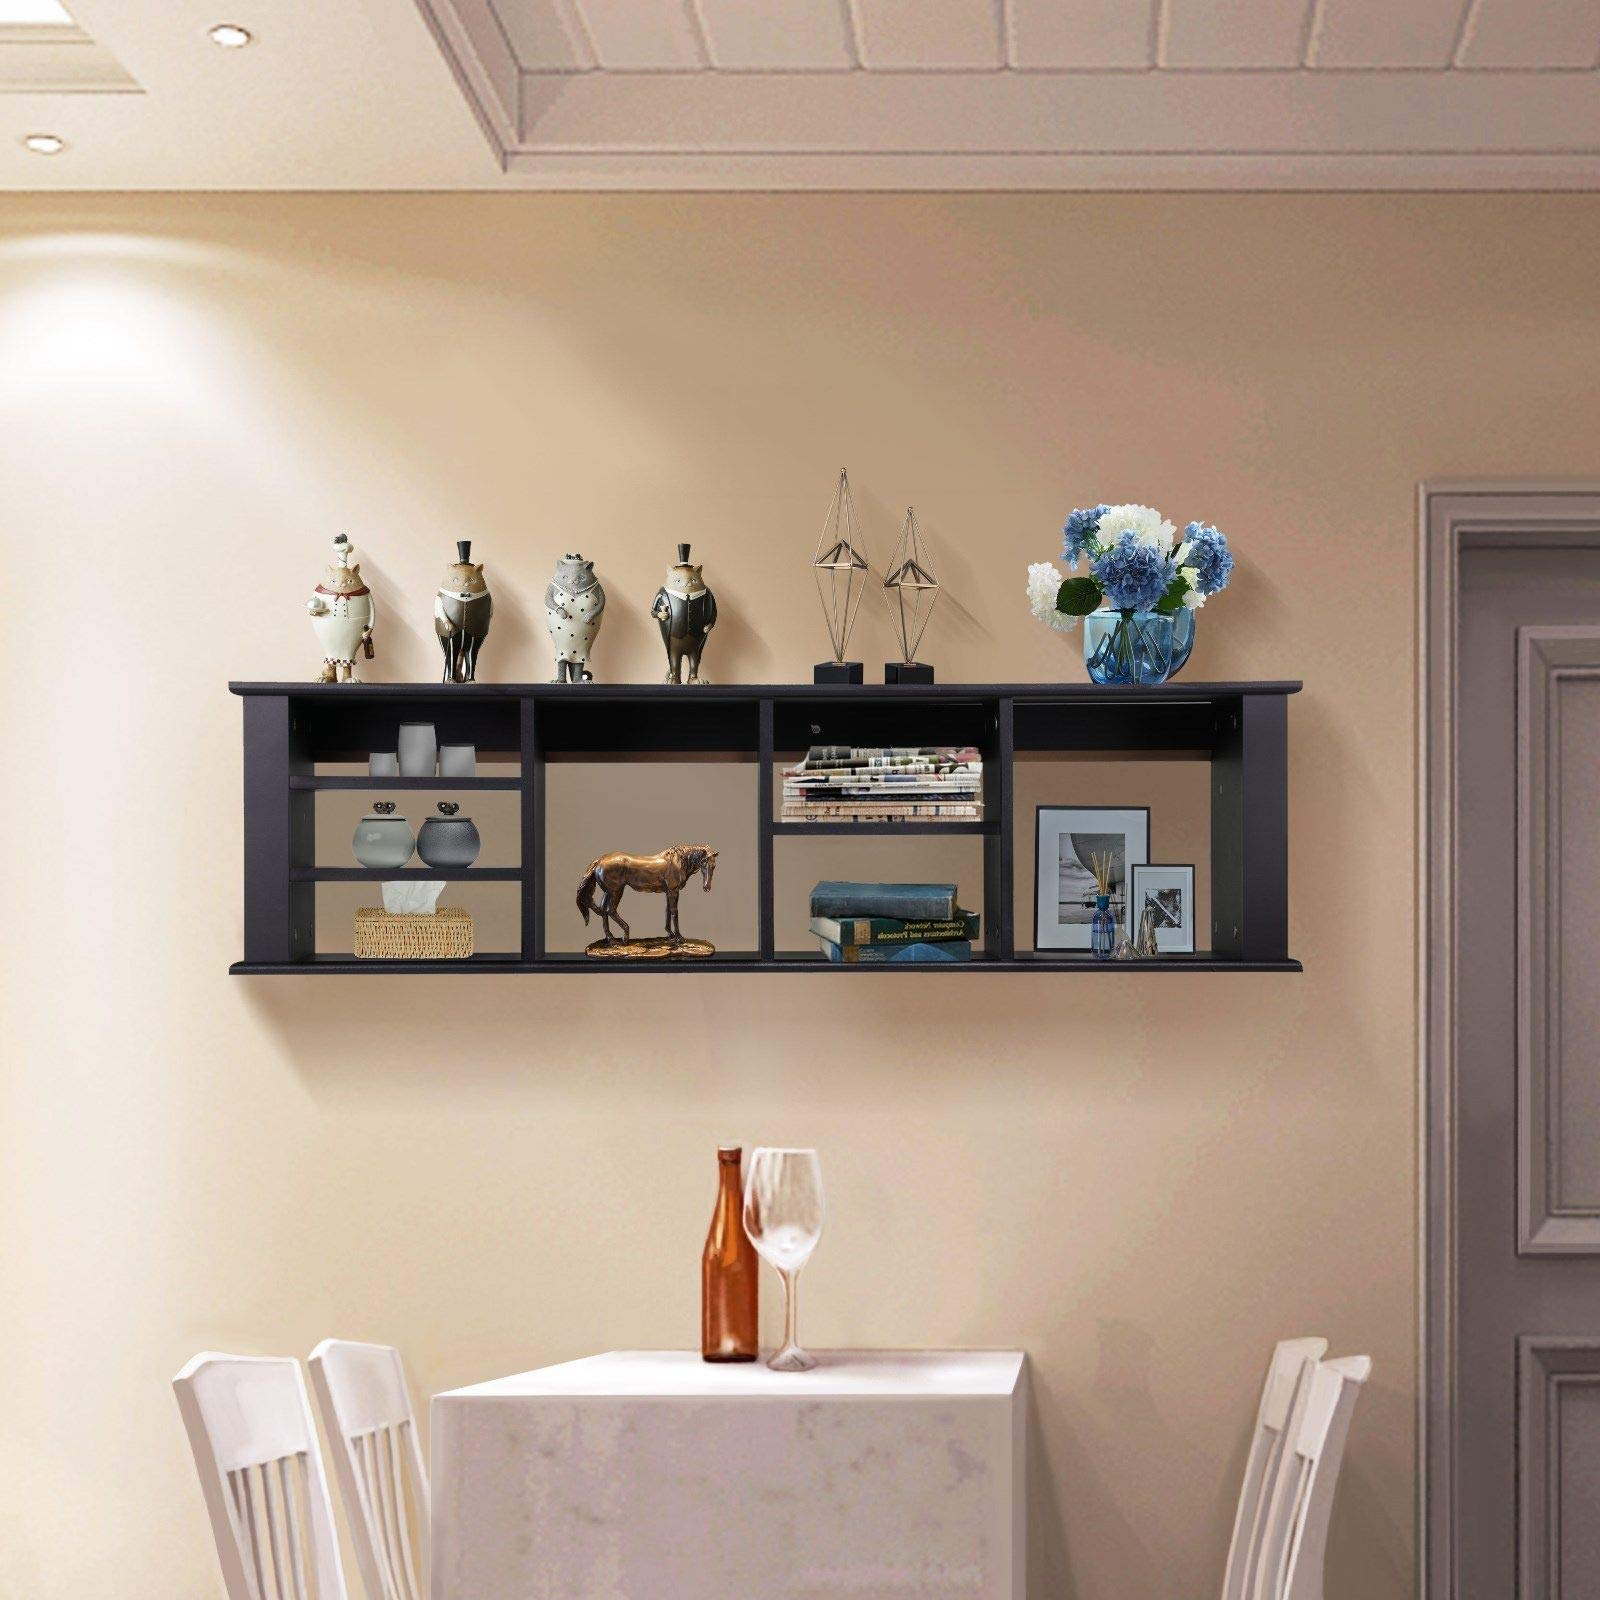 LOVELABEL Home Décor Wall Mounted Desk Hutch Floating Storage Shelf Hanging Cabinet Organizer